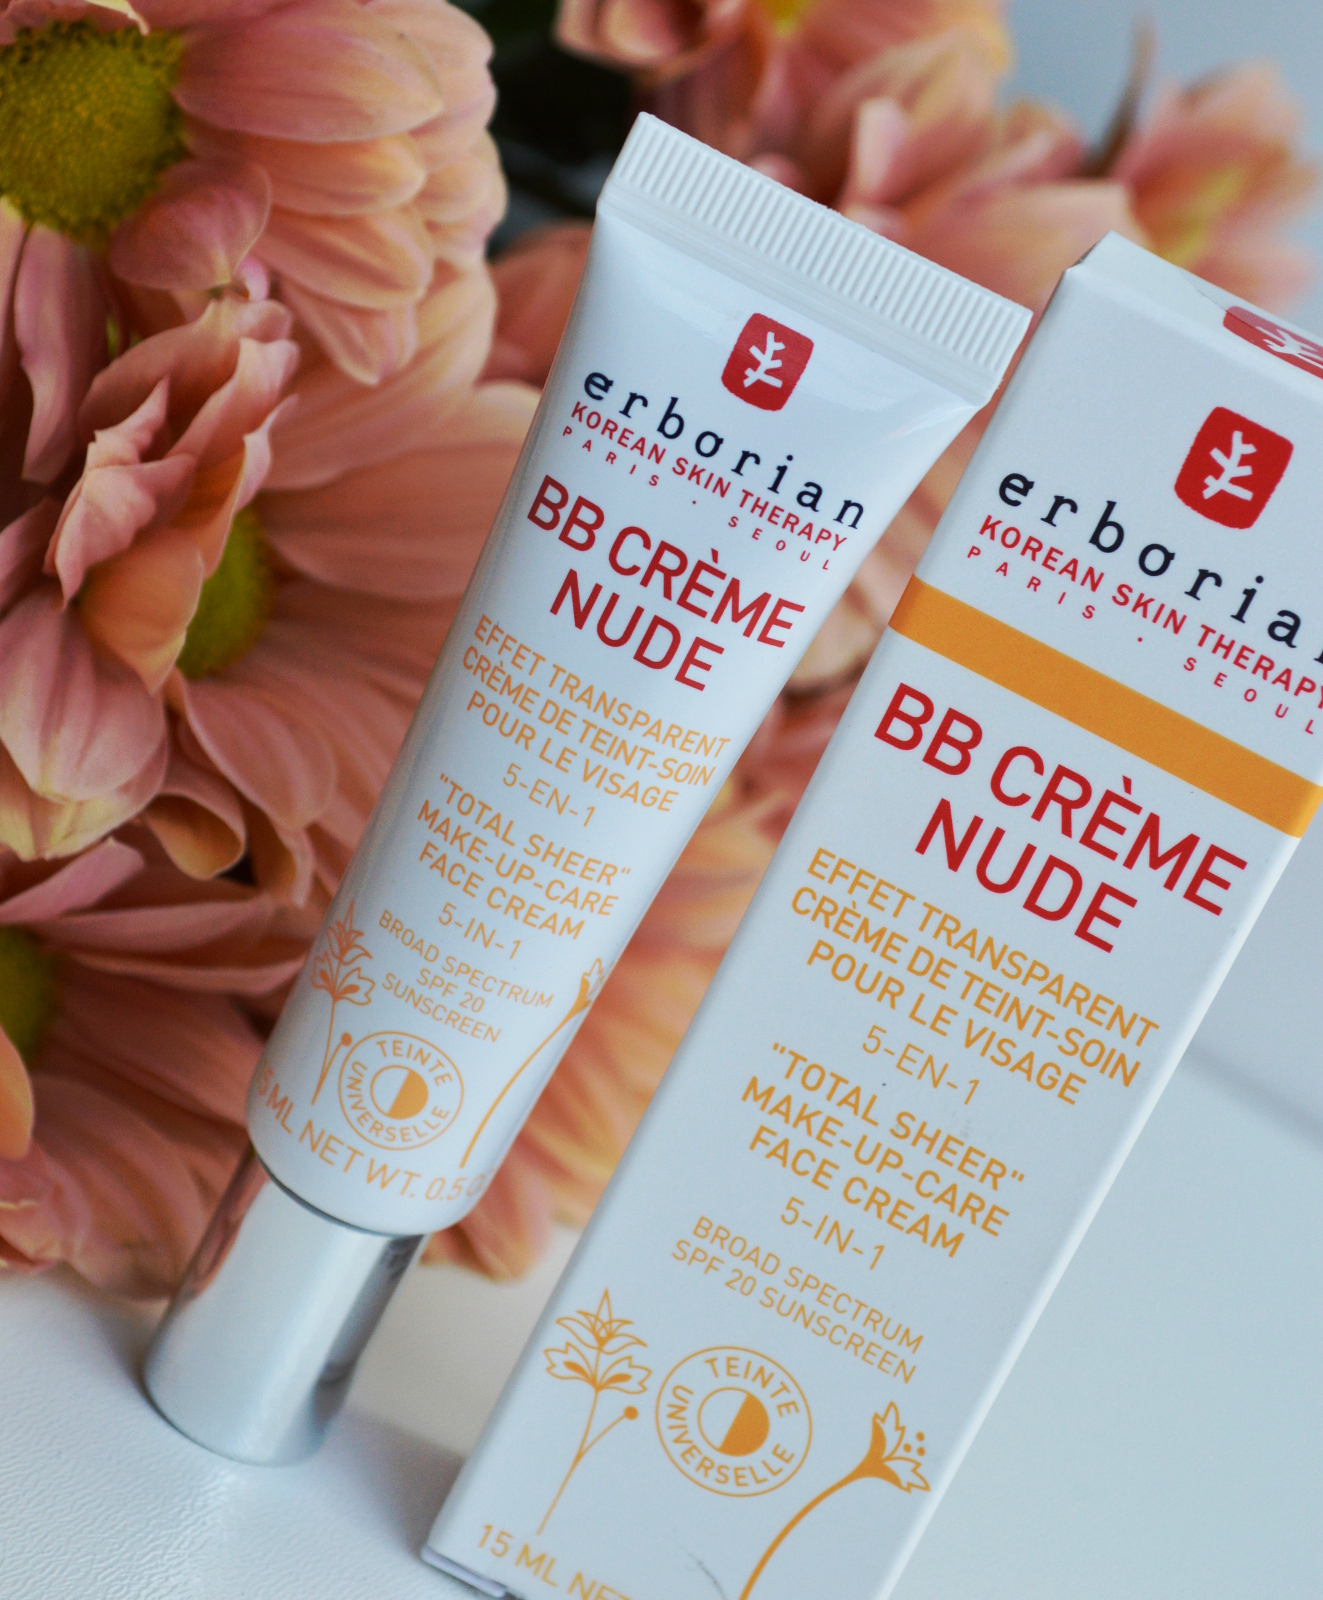 ERBORIAN BB Crème nude tube 15ml - Parapharmacie en ligne